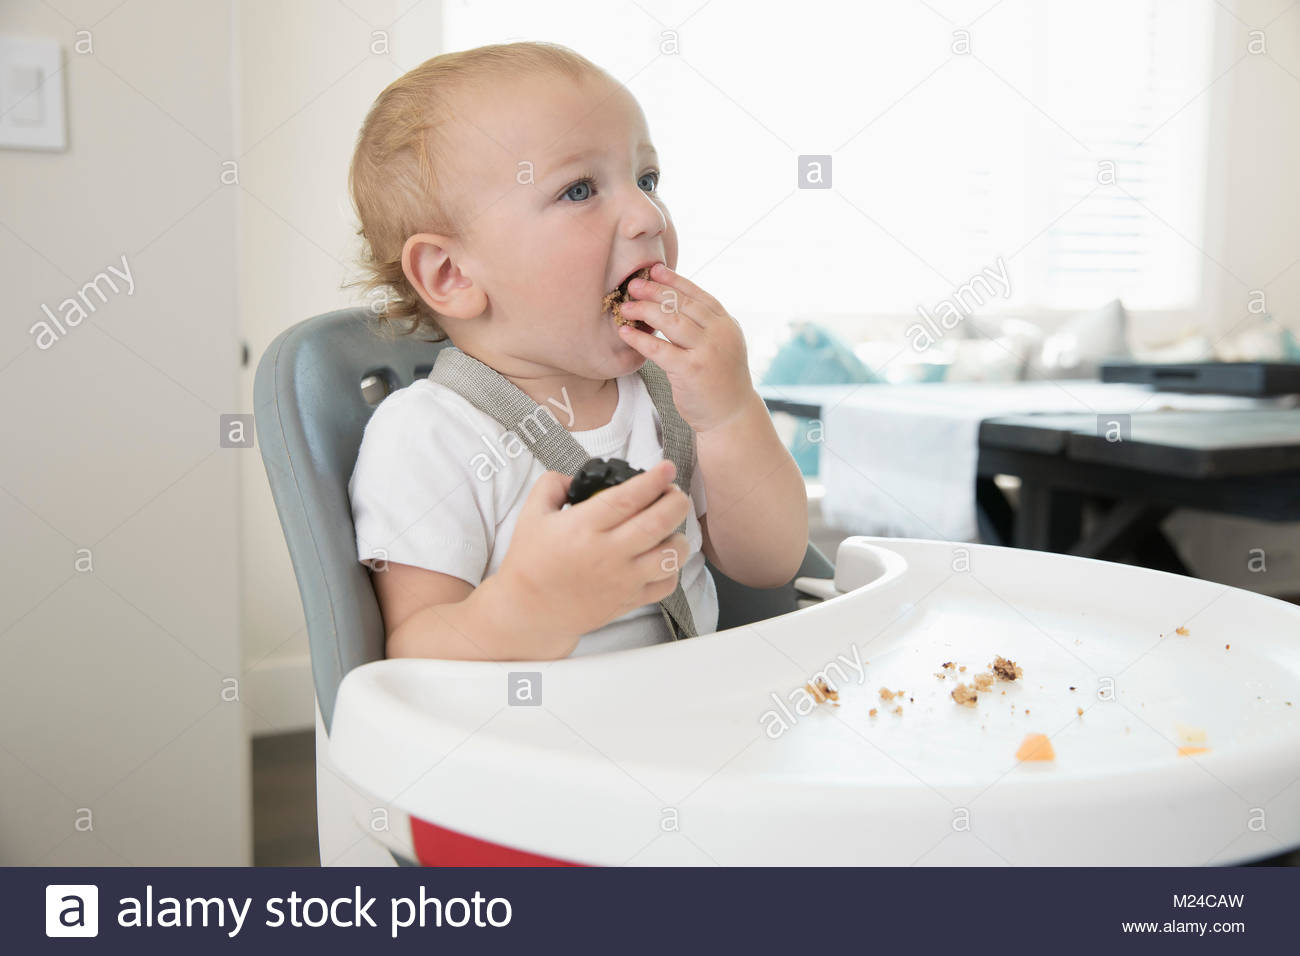 Bébé garçon malpropre de manger dans une chaise haute Photo Stock